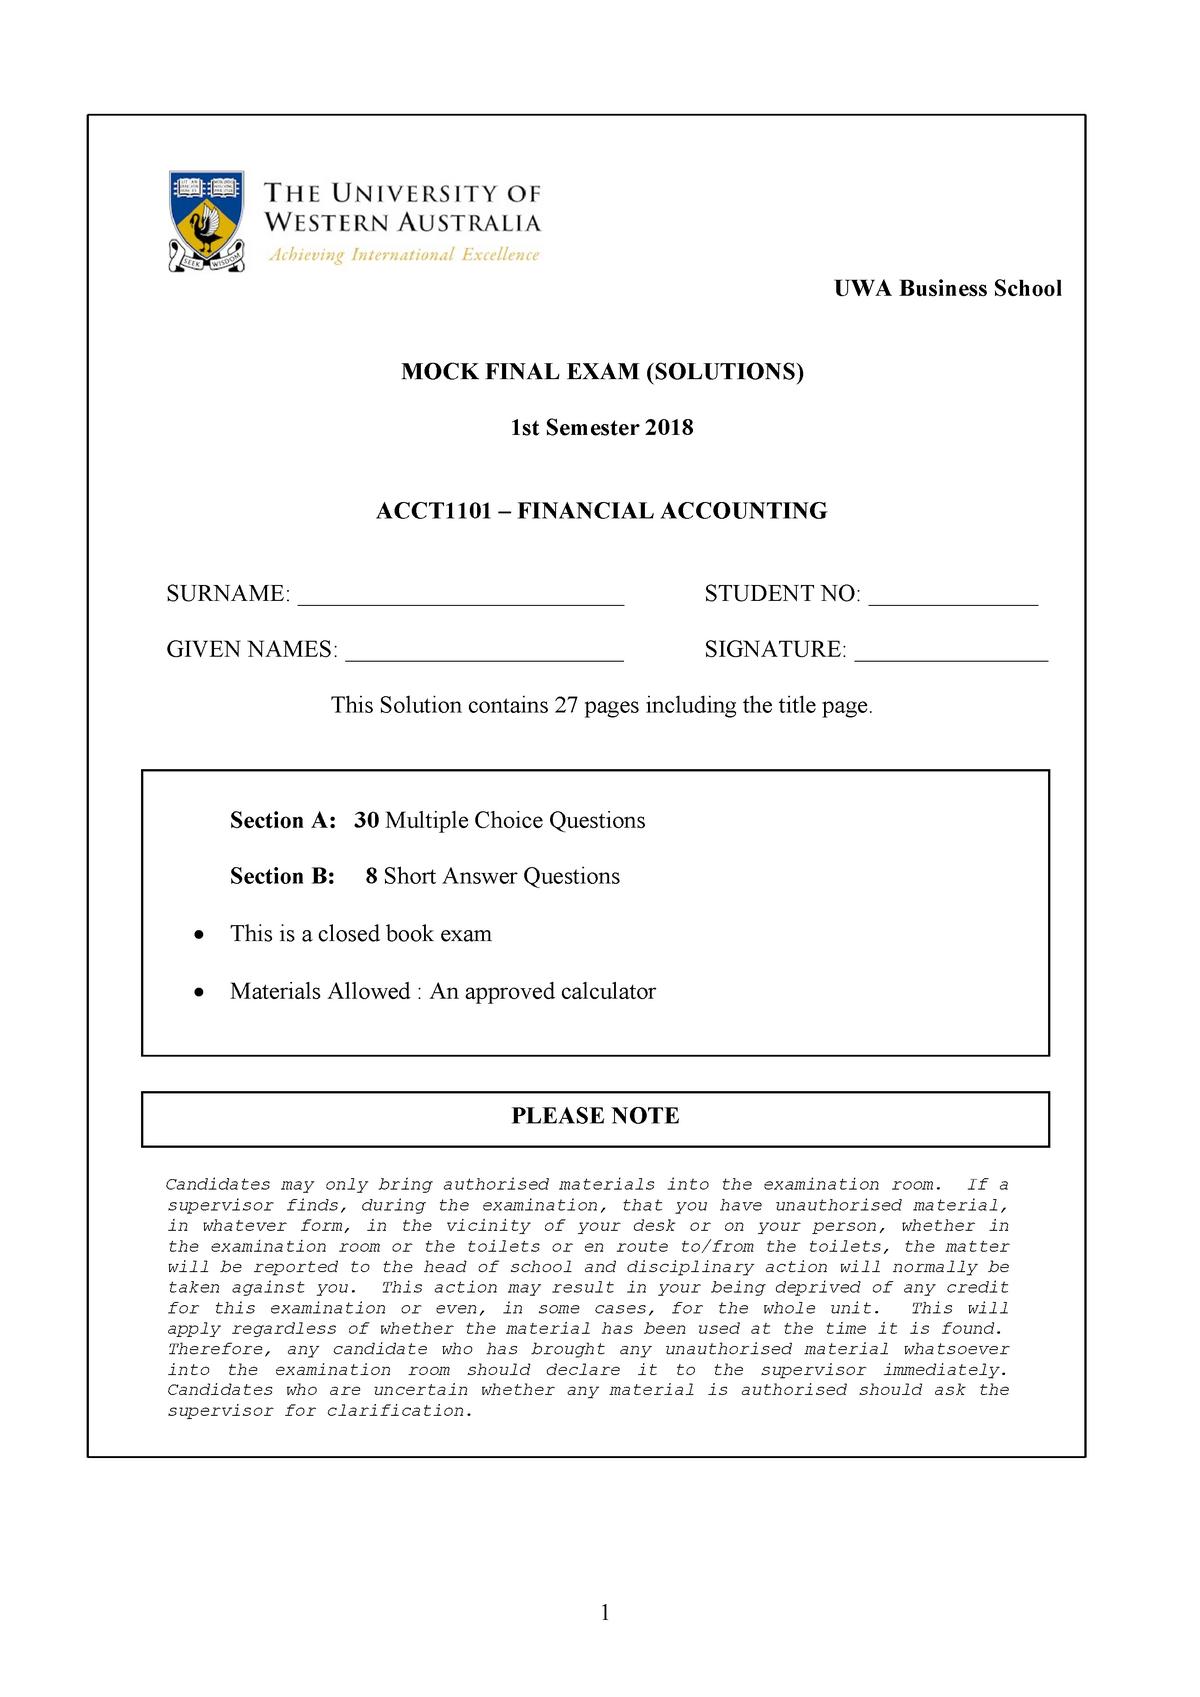 Exam 2018 - ACCT1101 : Financial Accounting - StuDocu